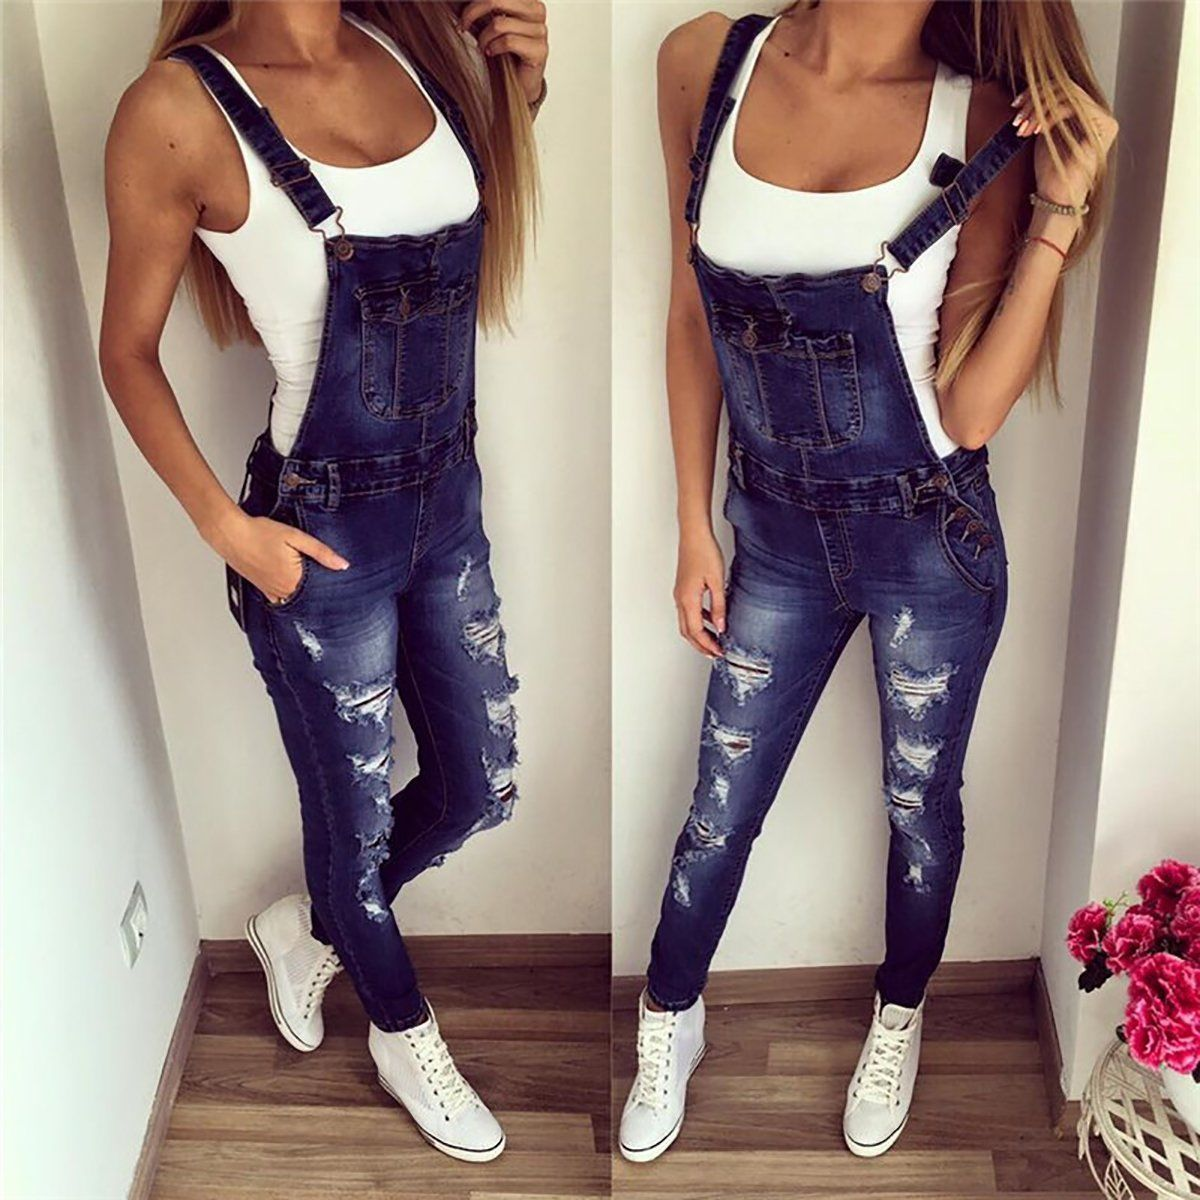 f9eb413c402 Women Girls Denim Bib Pants Overalls Suspender Trousers Jeans Jumpsuit  Romper